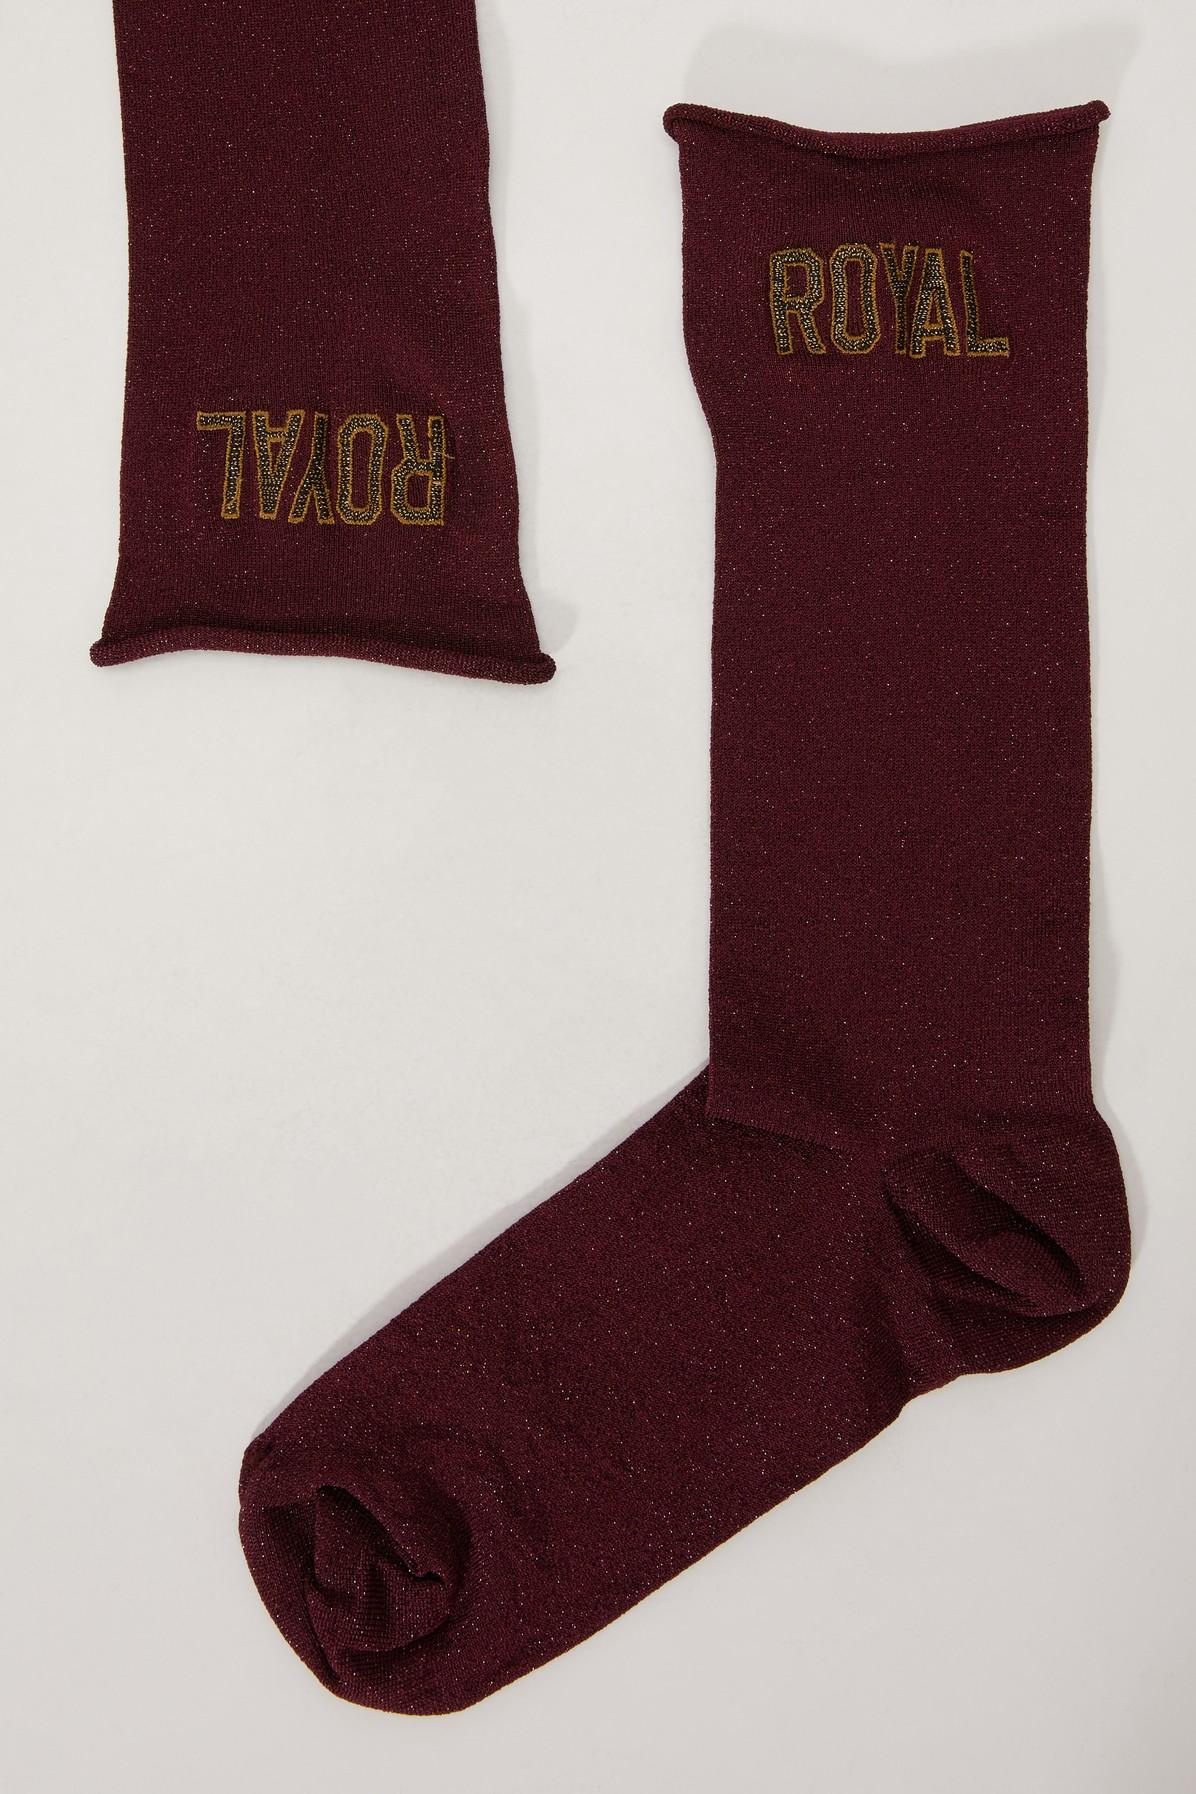 Dolce & Gabbana Lurex Socks In Bordeaux